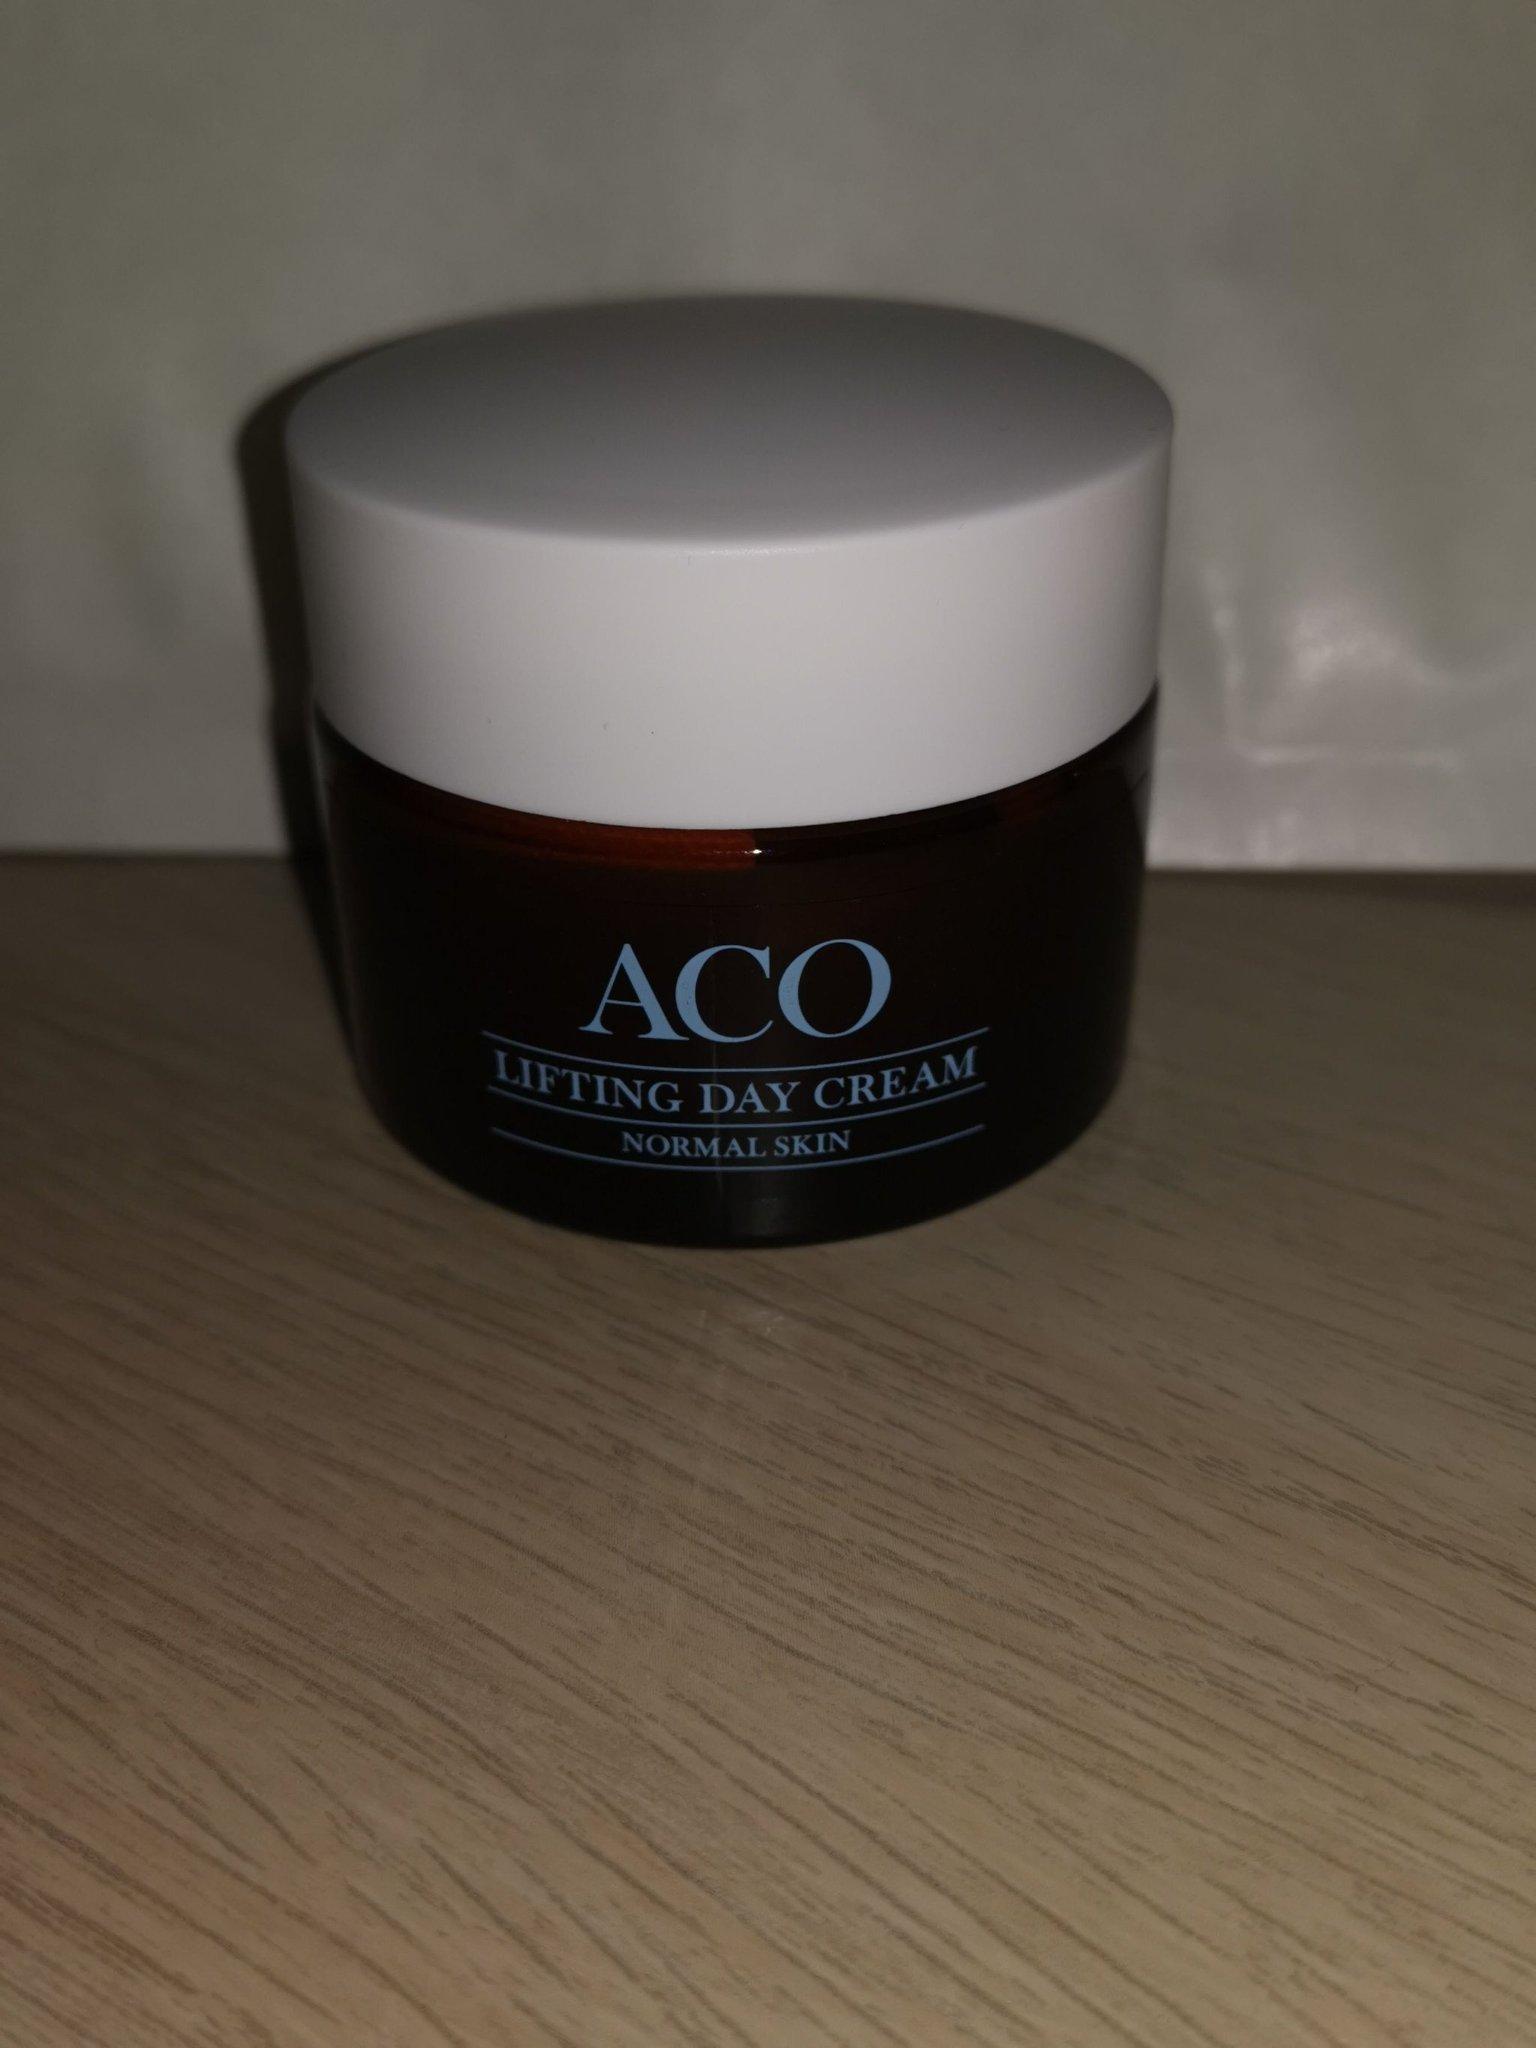 aco lifting day cream